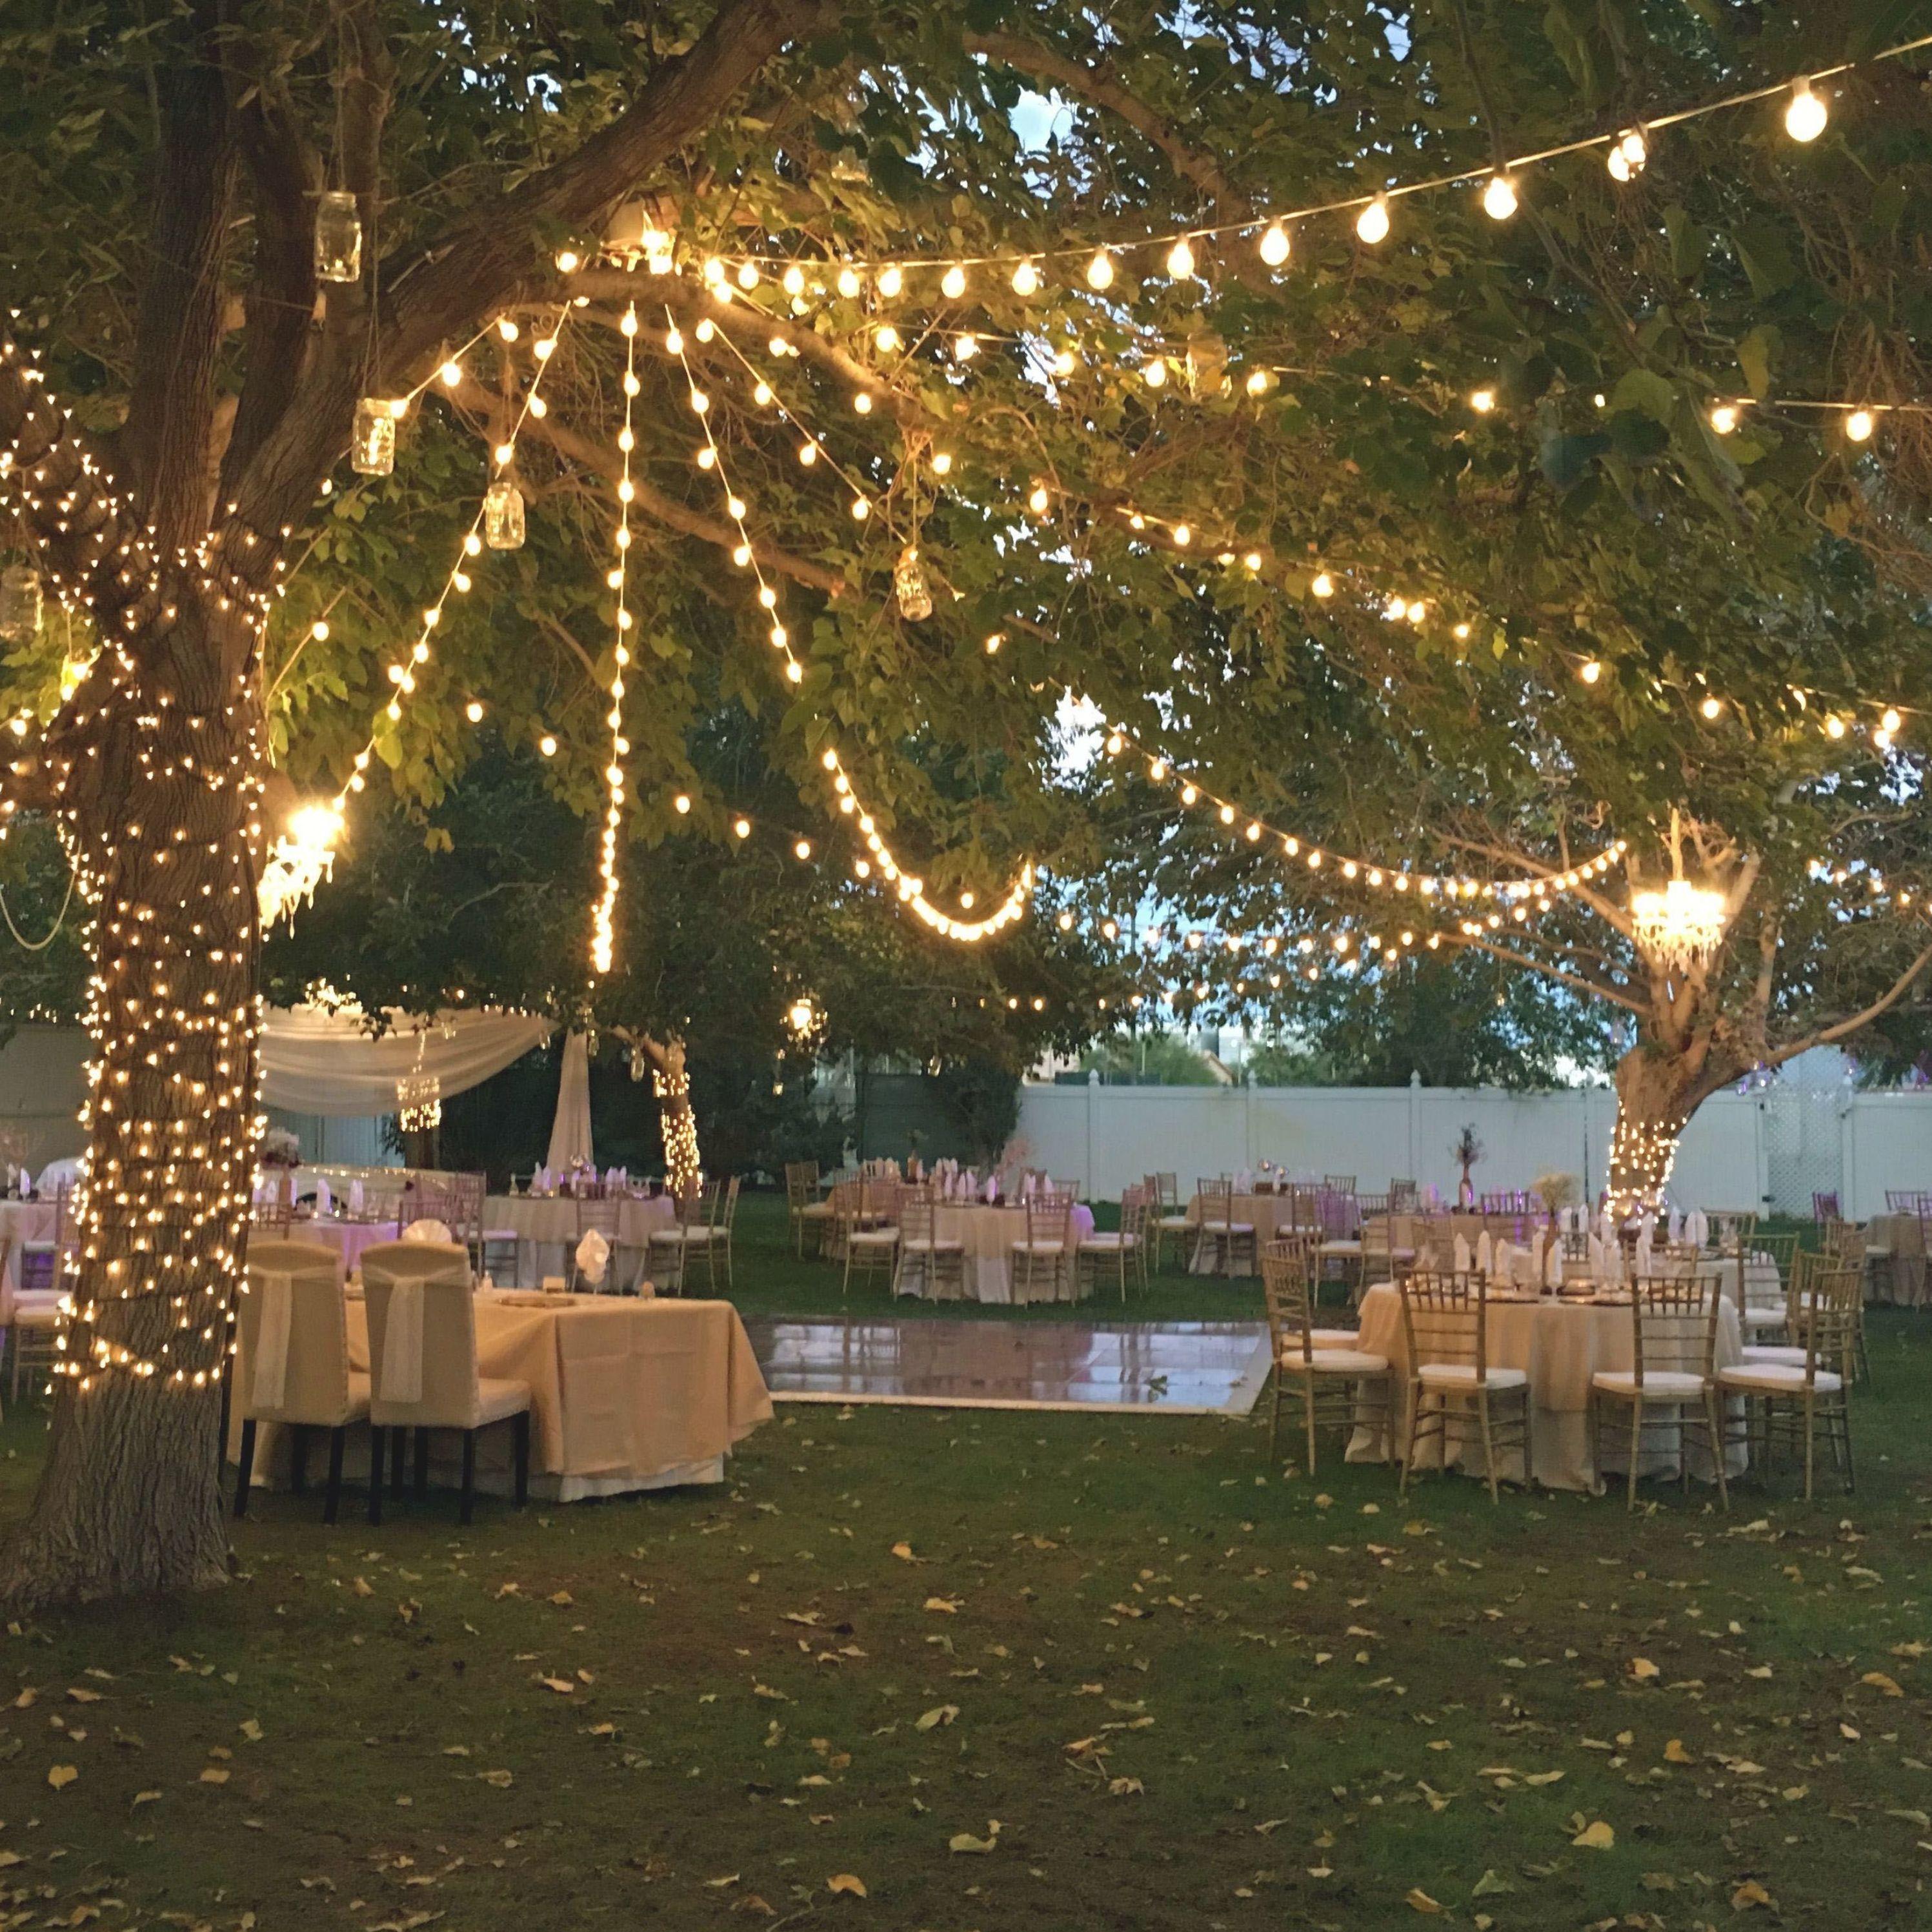 Create A Wedding Outdoor Ideas You Can Be Proud Of Jihanshanum Orlando Wedding Venues Seating Plan Wedding Bella Collina Wedding